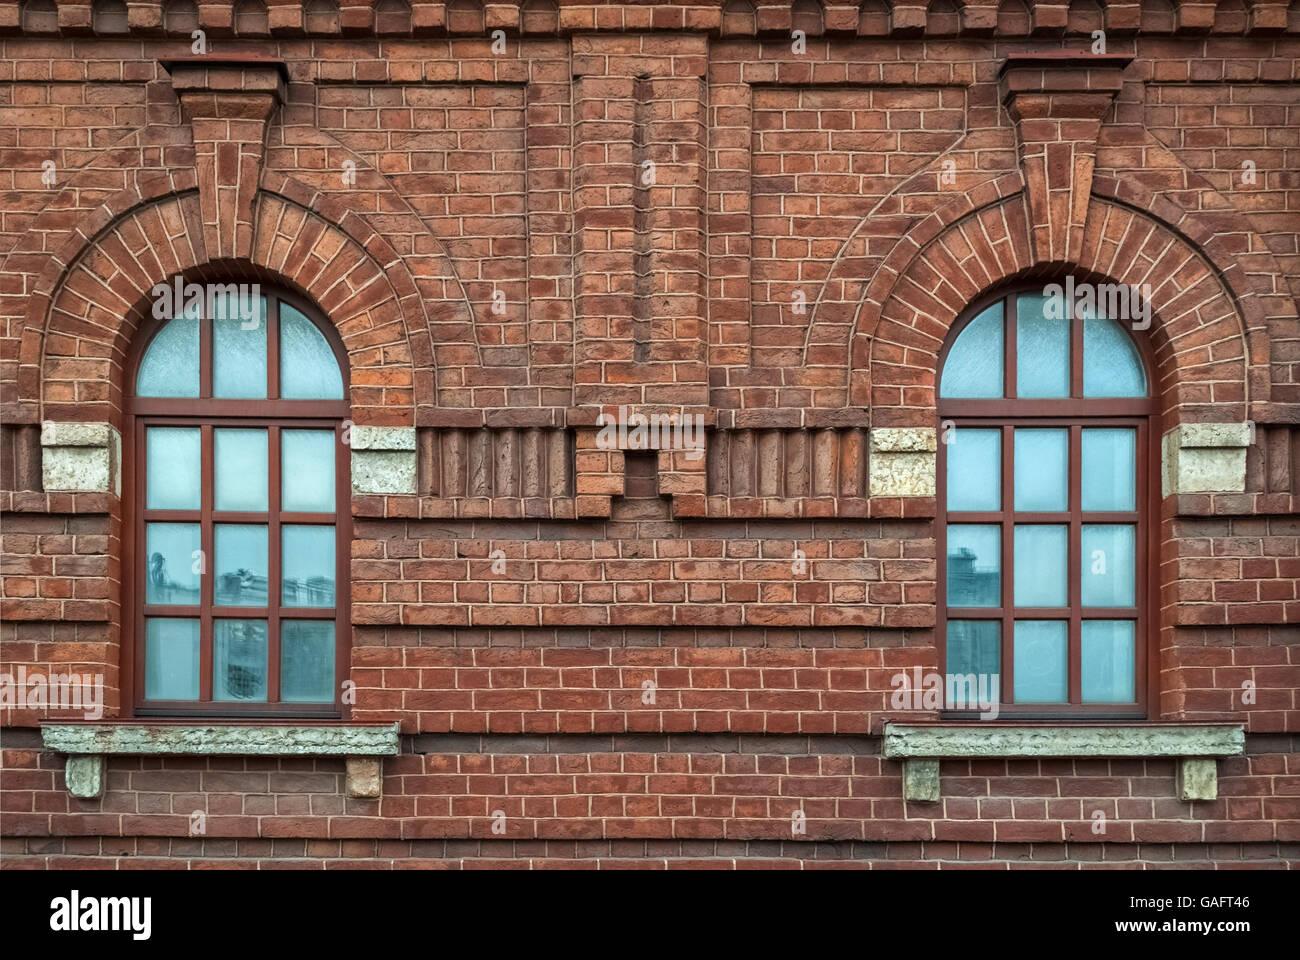 arch window brick building stockfotos arch window brick. Black Bedroom Furniture Sets. Home Design Ideas